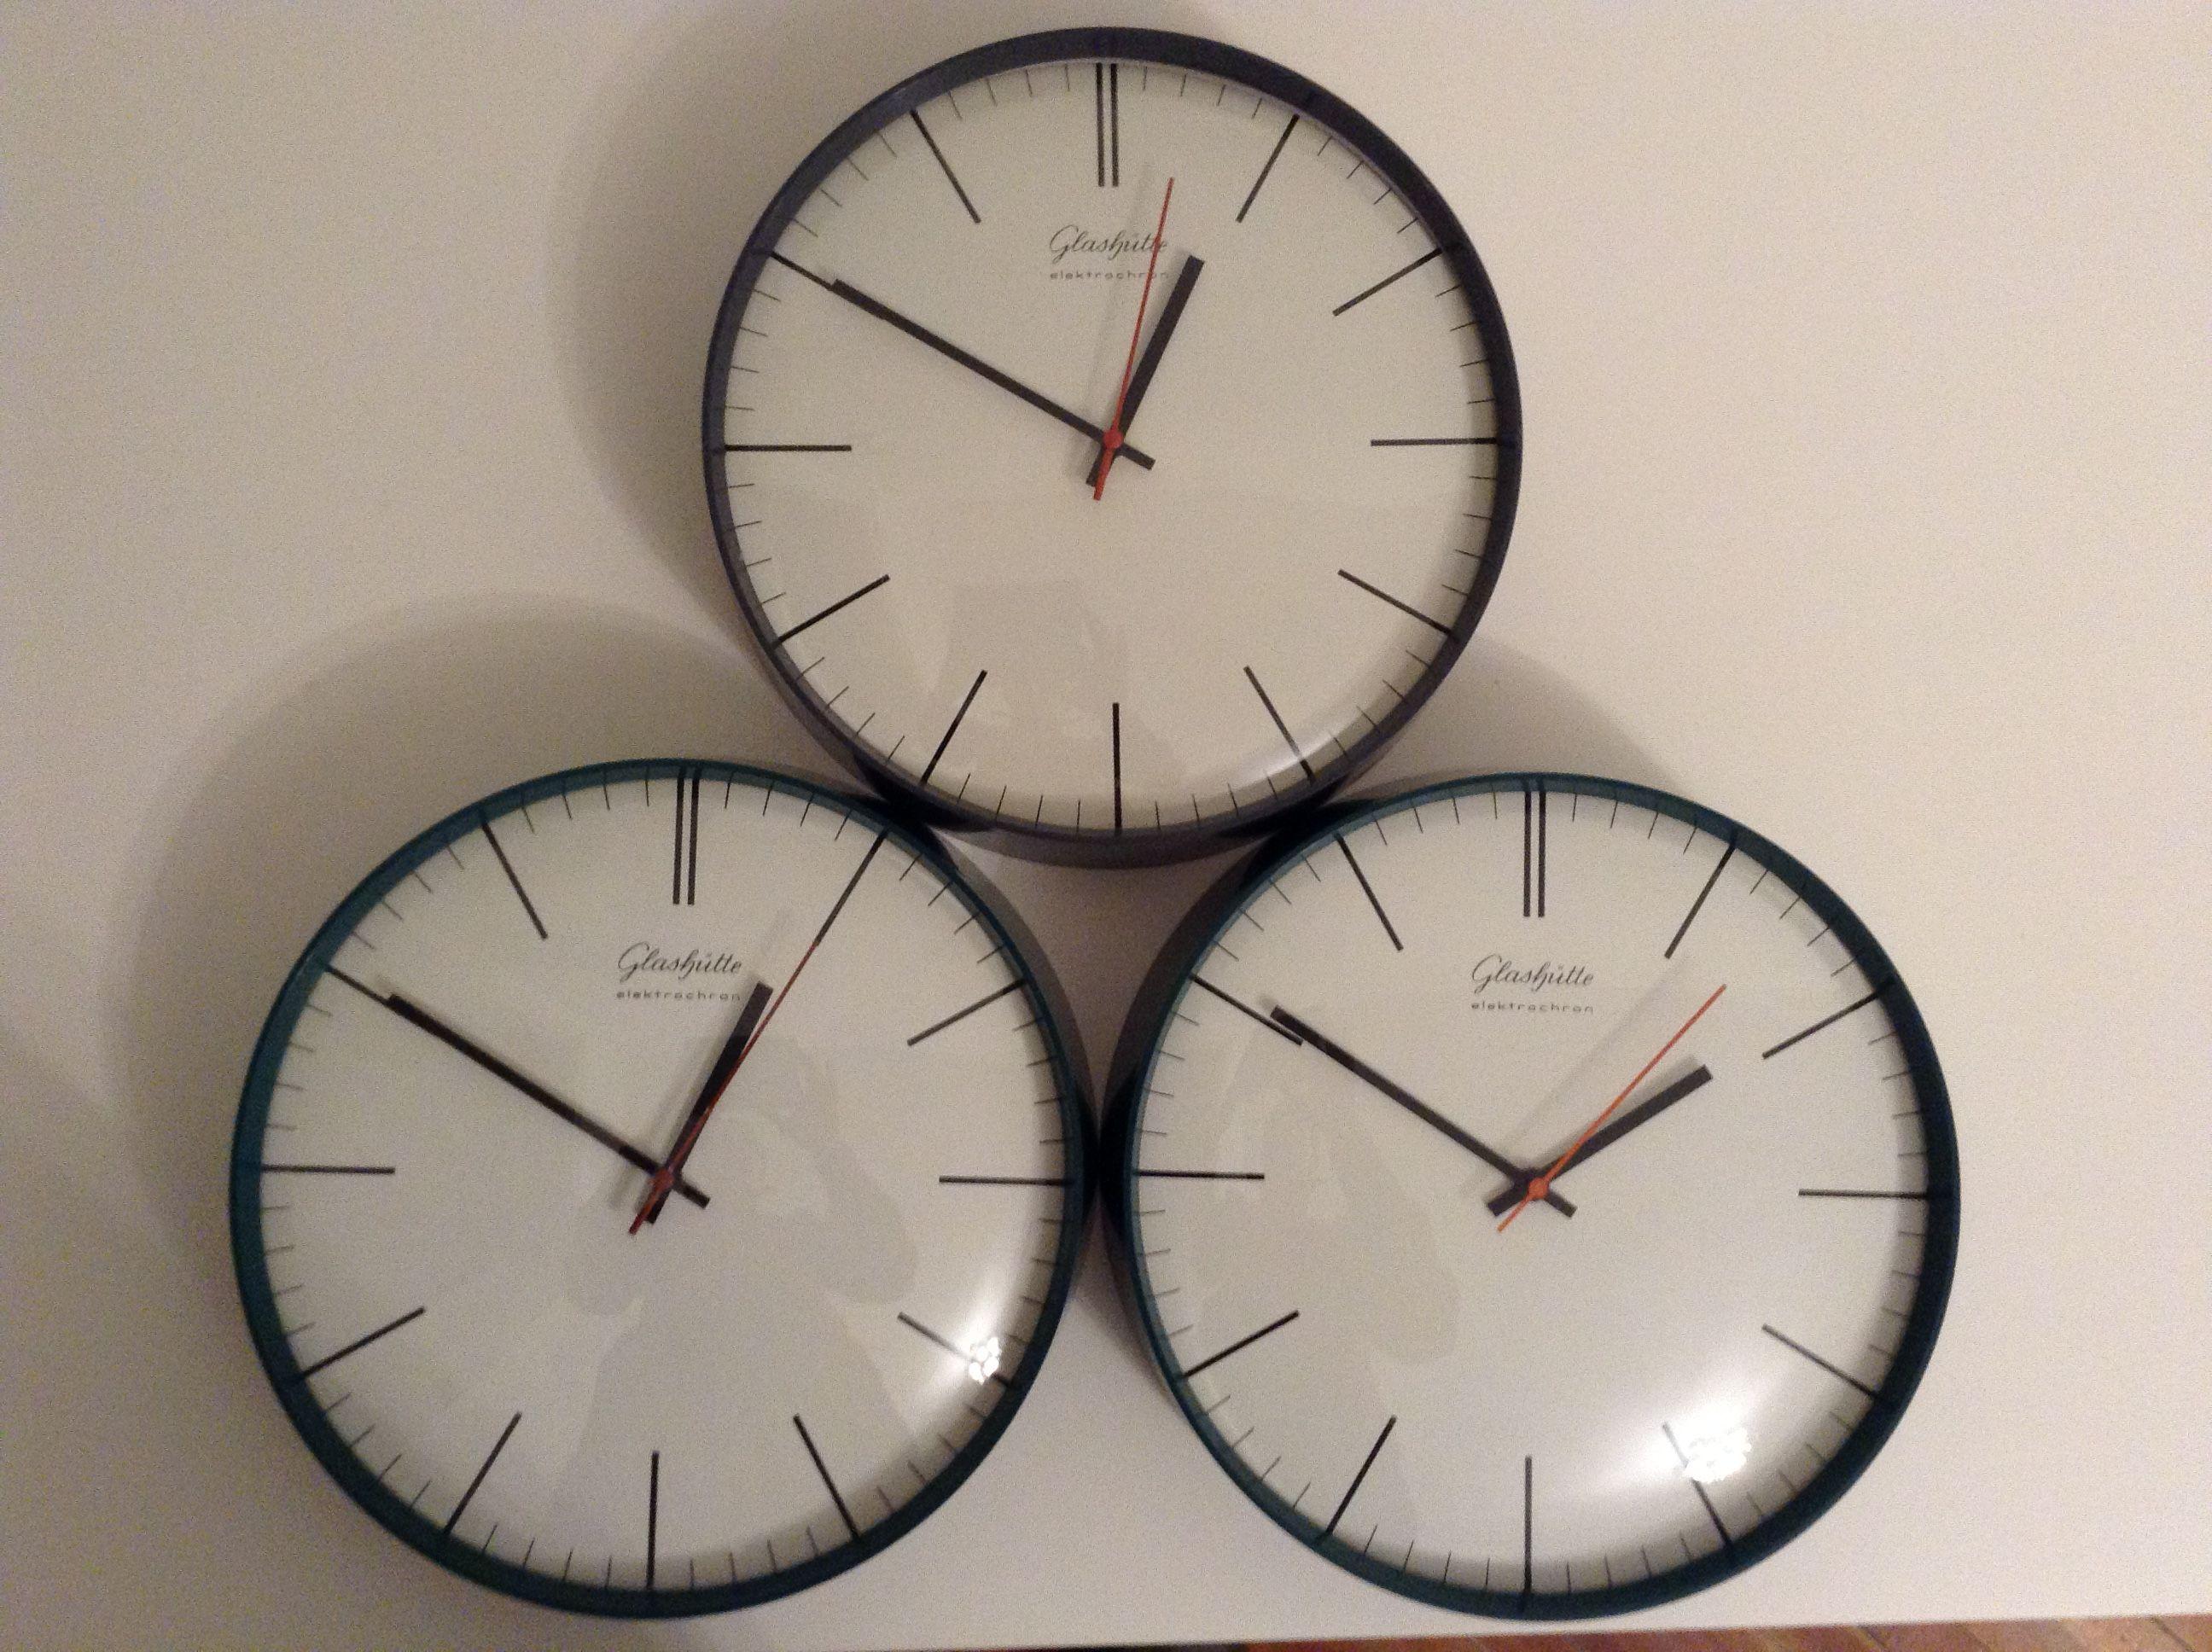 Glashutte Elektrochron Electric Wall Clock From East Germany Clock Wall Clock Special Clock